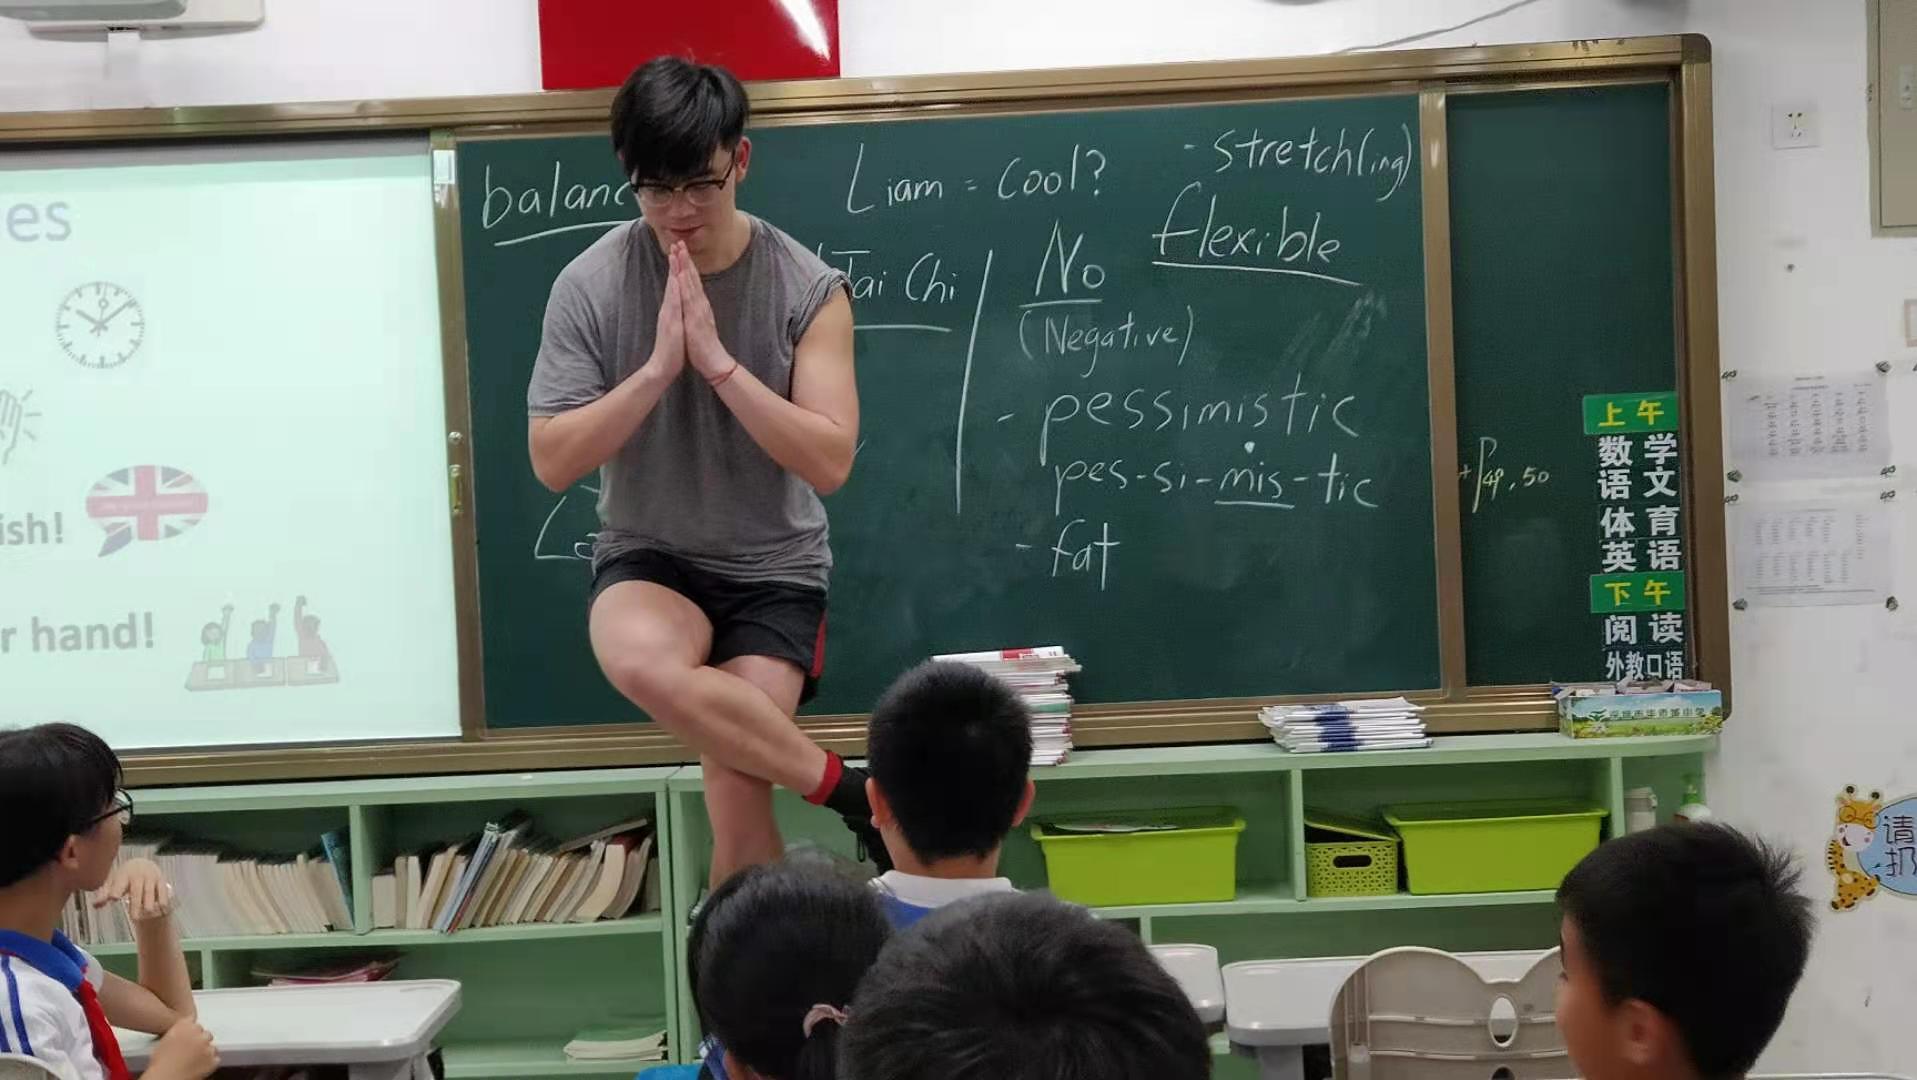 TEFL China, TEFL China – A Teachers Perspective, SDE Seadragon Education